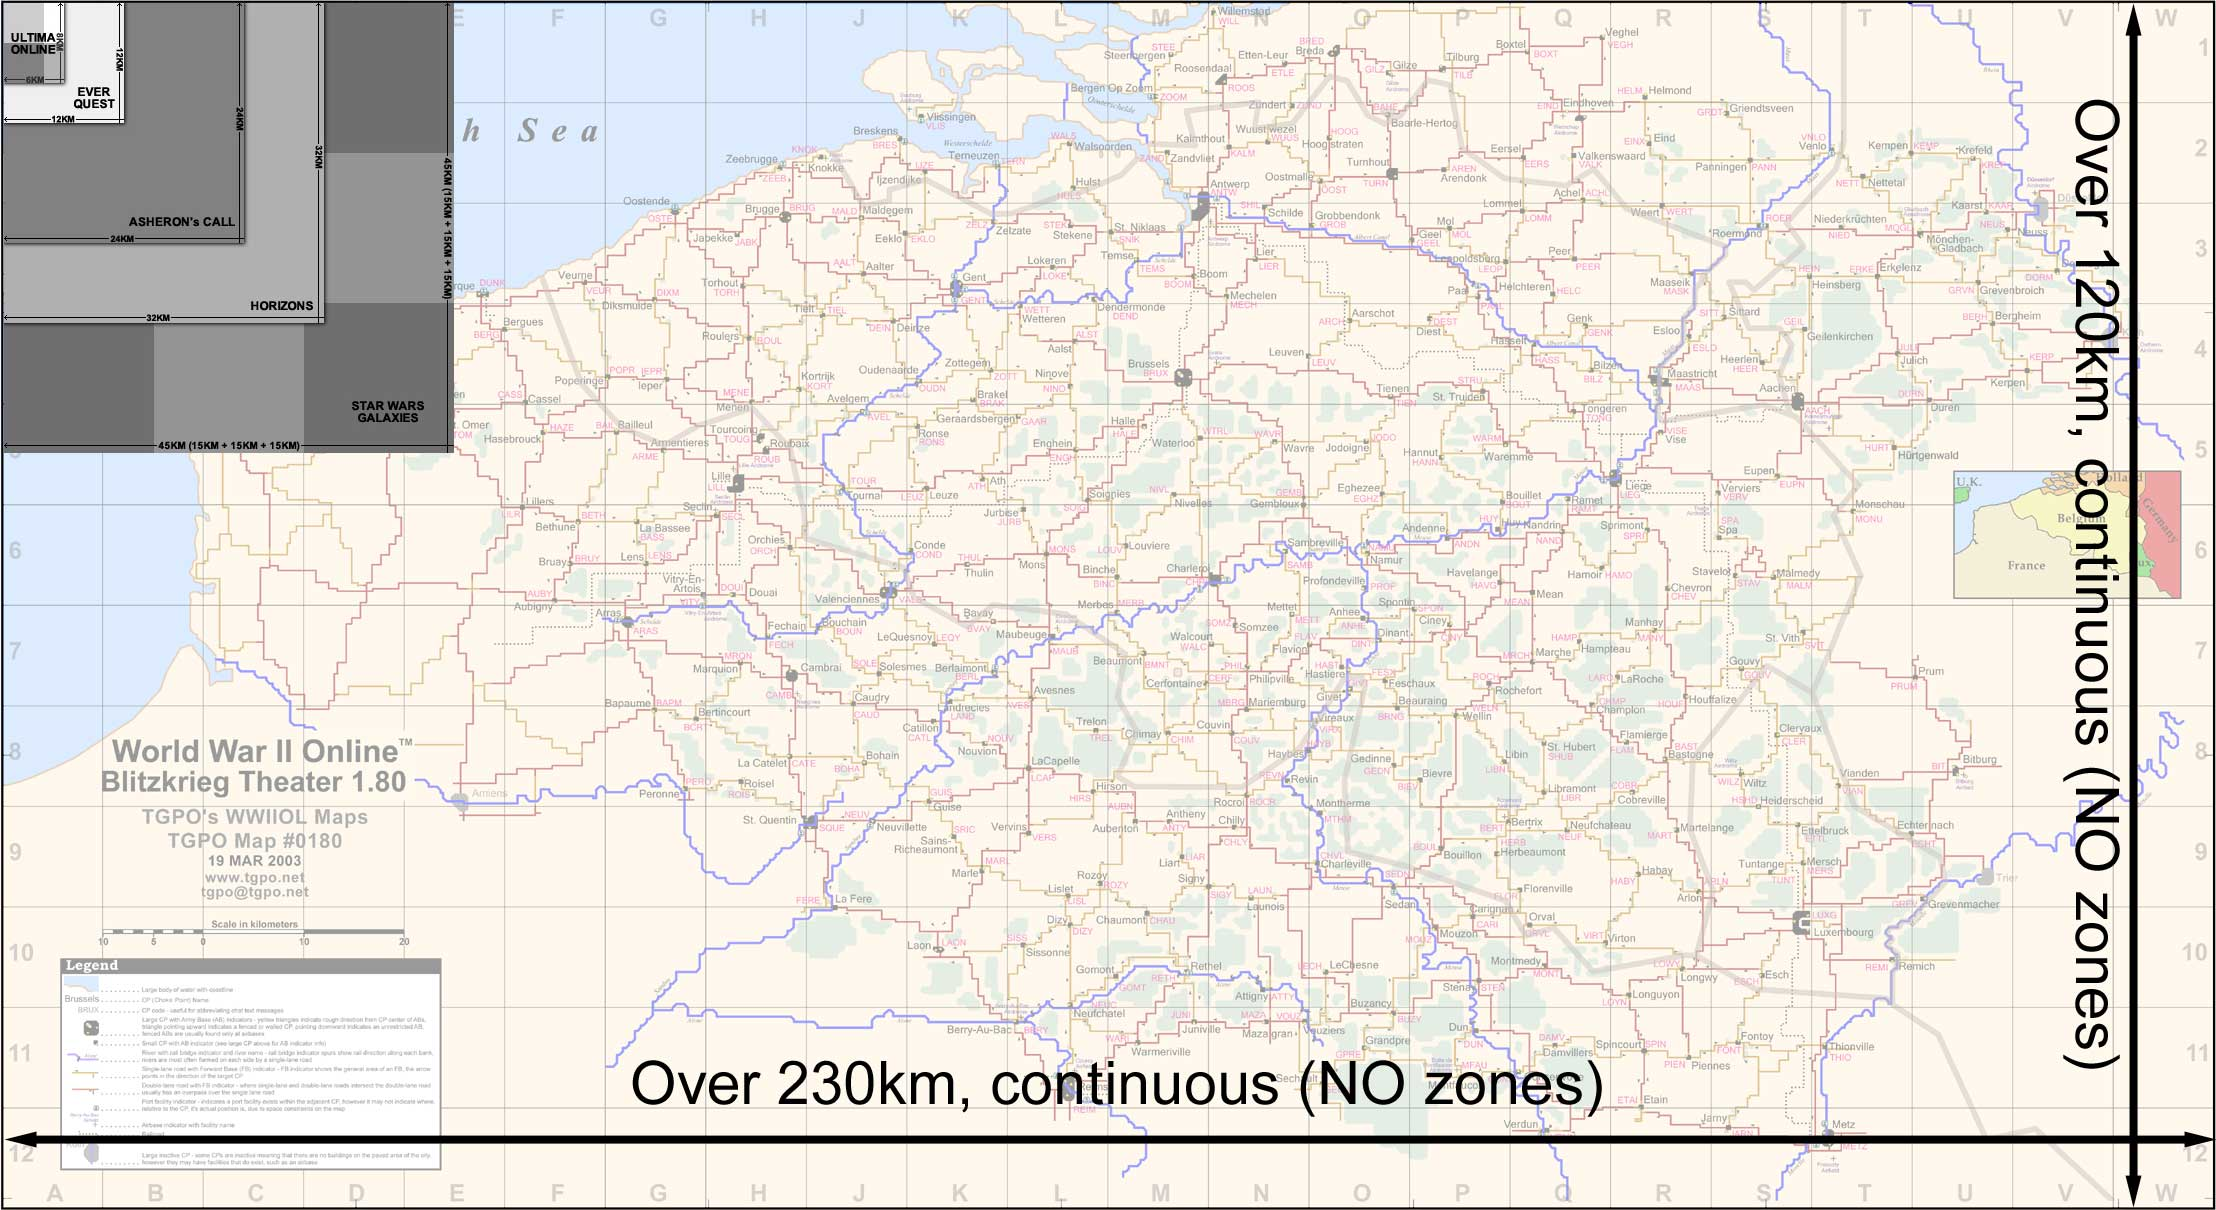 WW2OL Map size 1_80.jpg